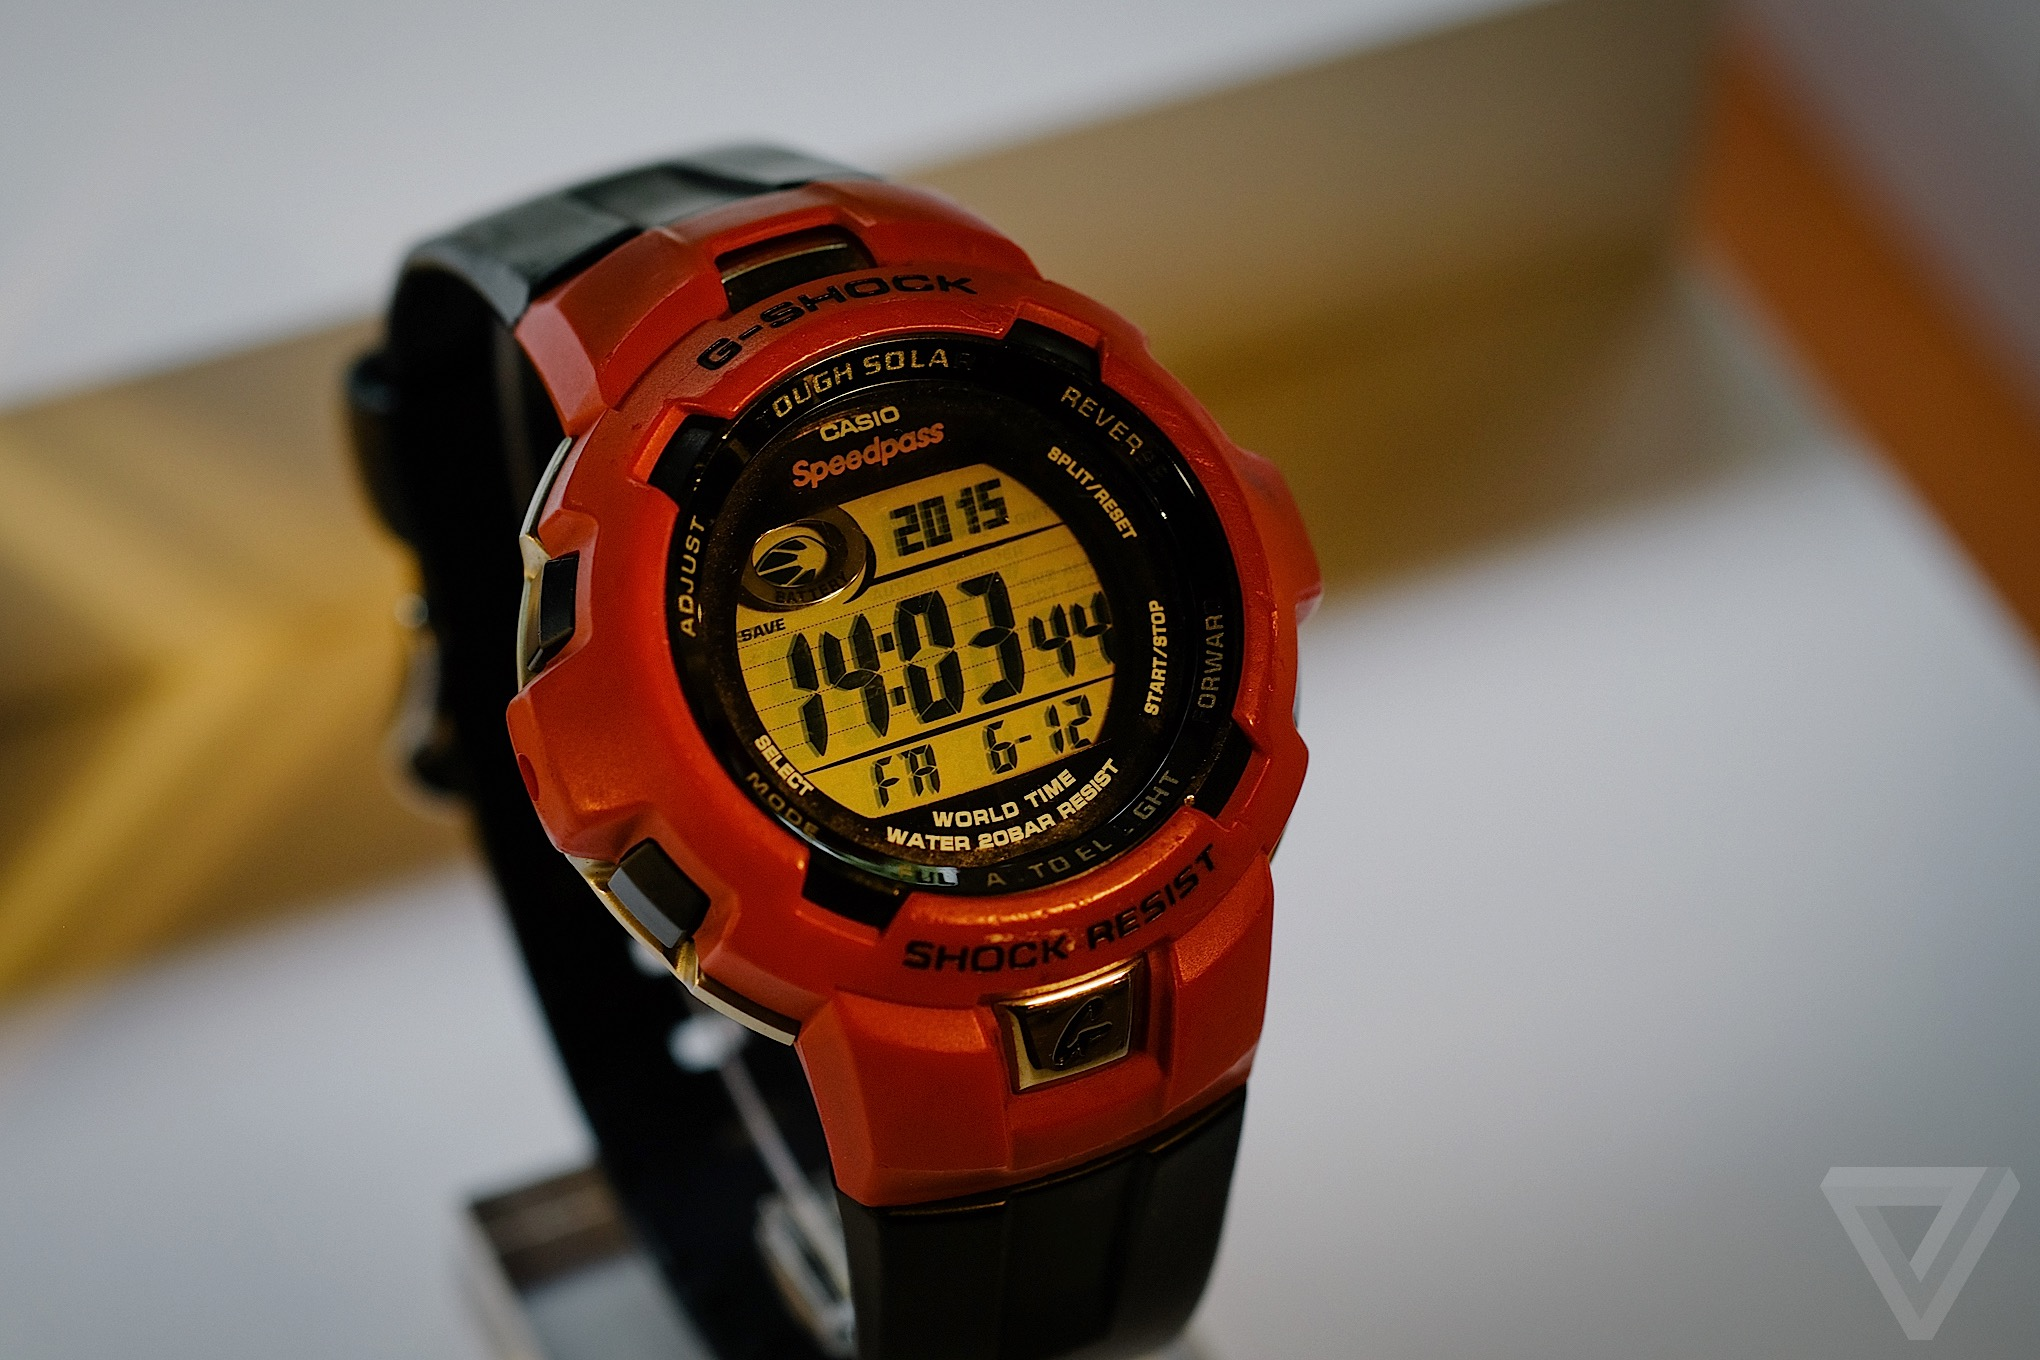 094cc0671af8 The original smartwatches  Casio s history of wild wrist designs ...